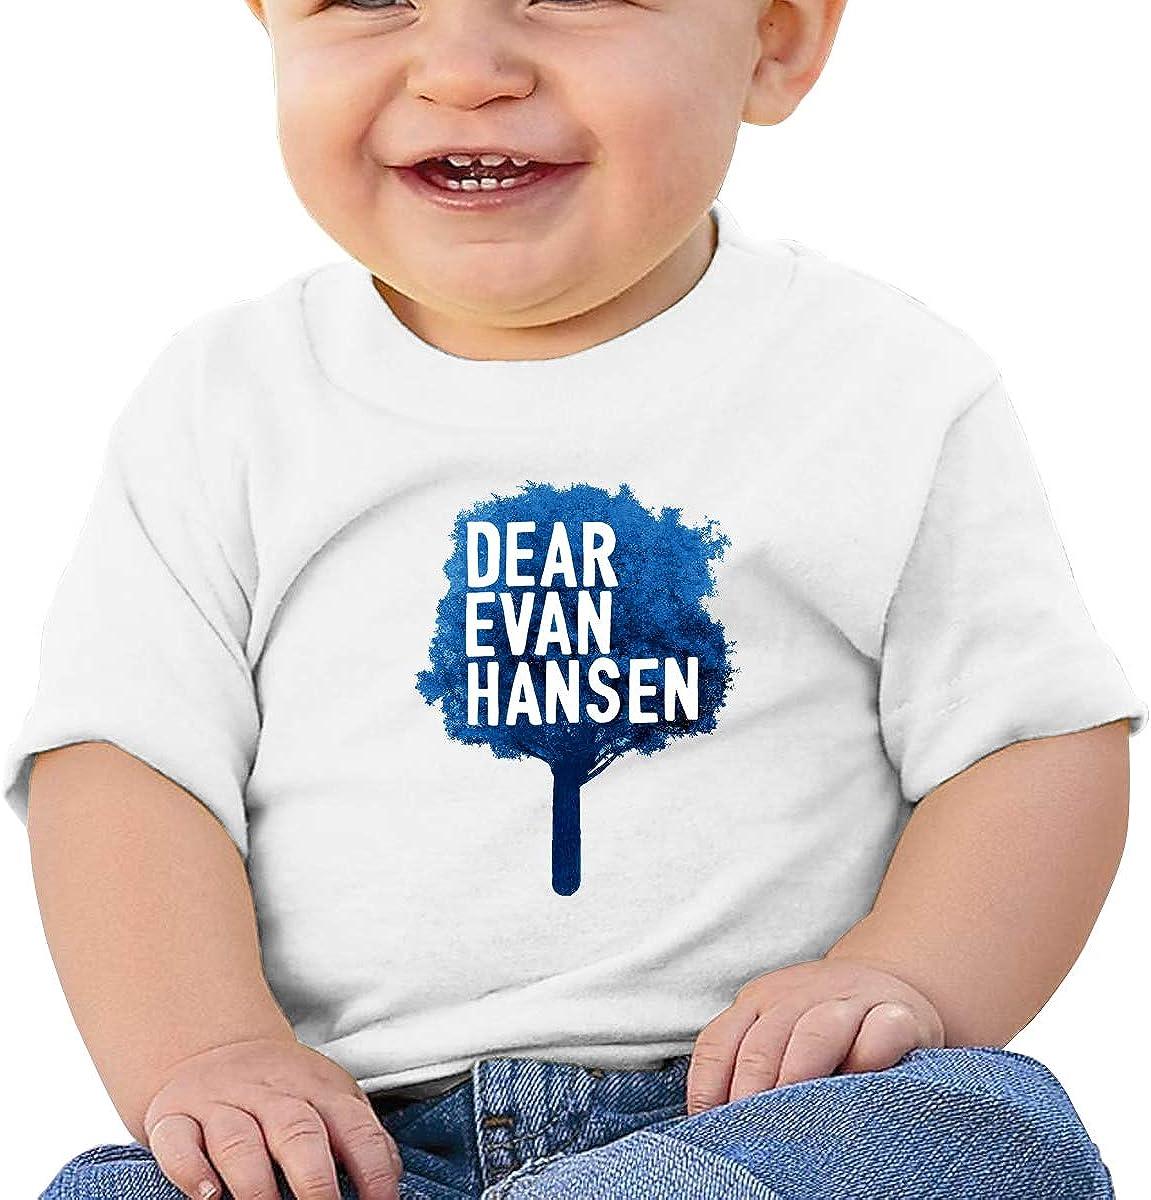 Dear Evan Hansen Short Sleeve Trottie T Shirts Cotton Round Collar Tee Shirt